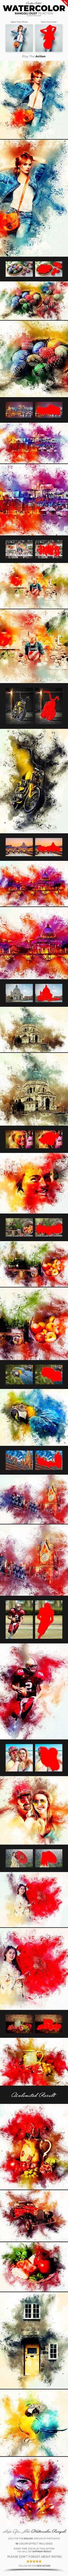 Watercolor Rangoli Dust Photoshop Action